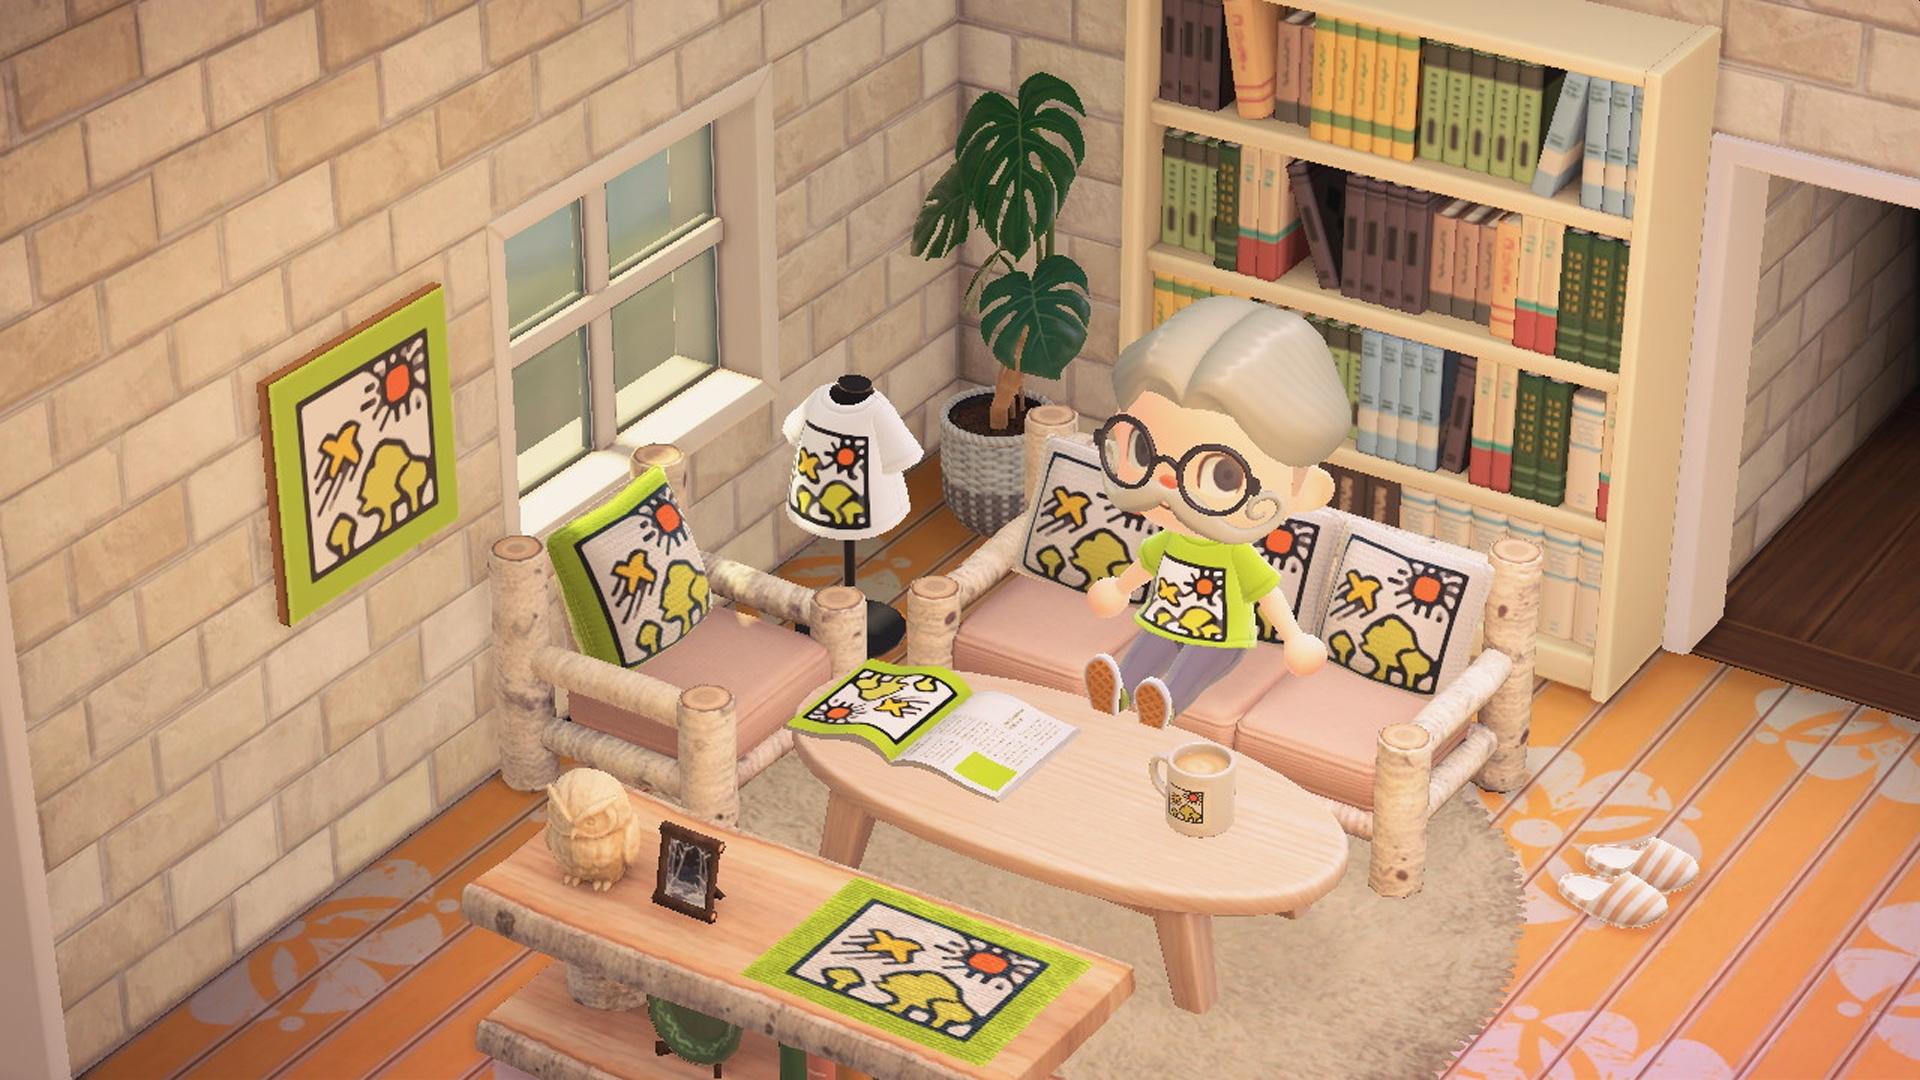 Kikkoman Releases An Original Design For Animal Crossing: New Horizons